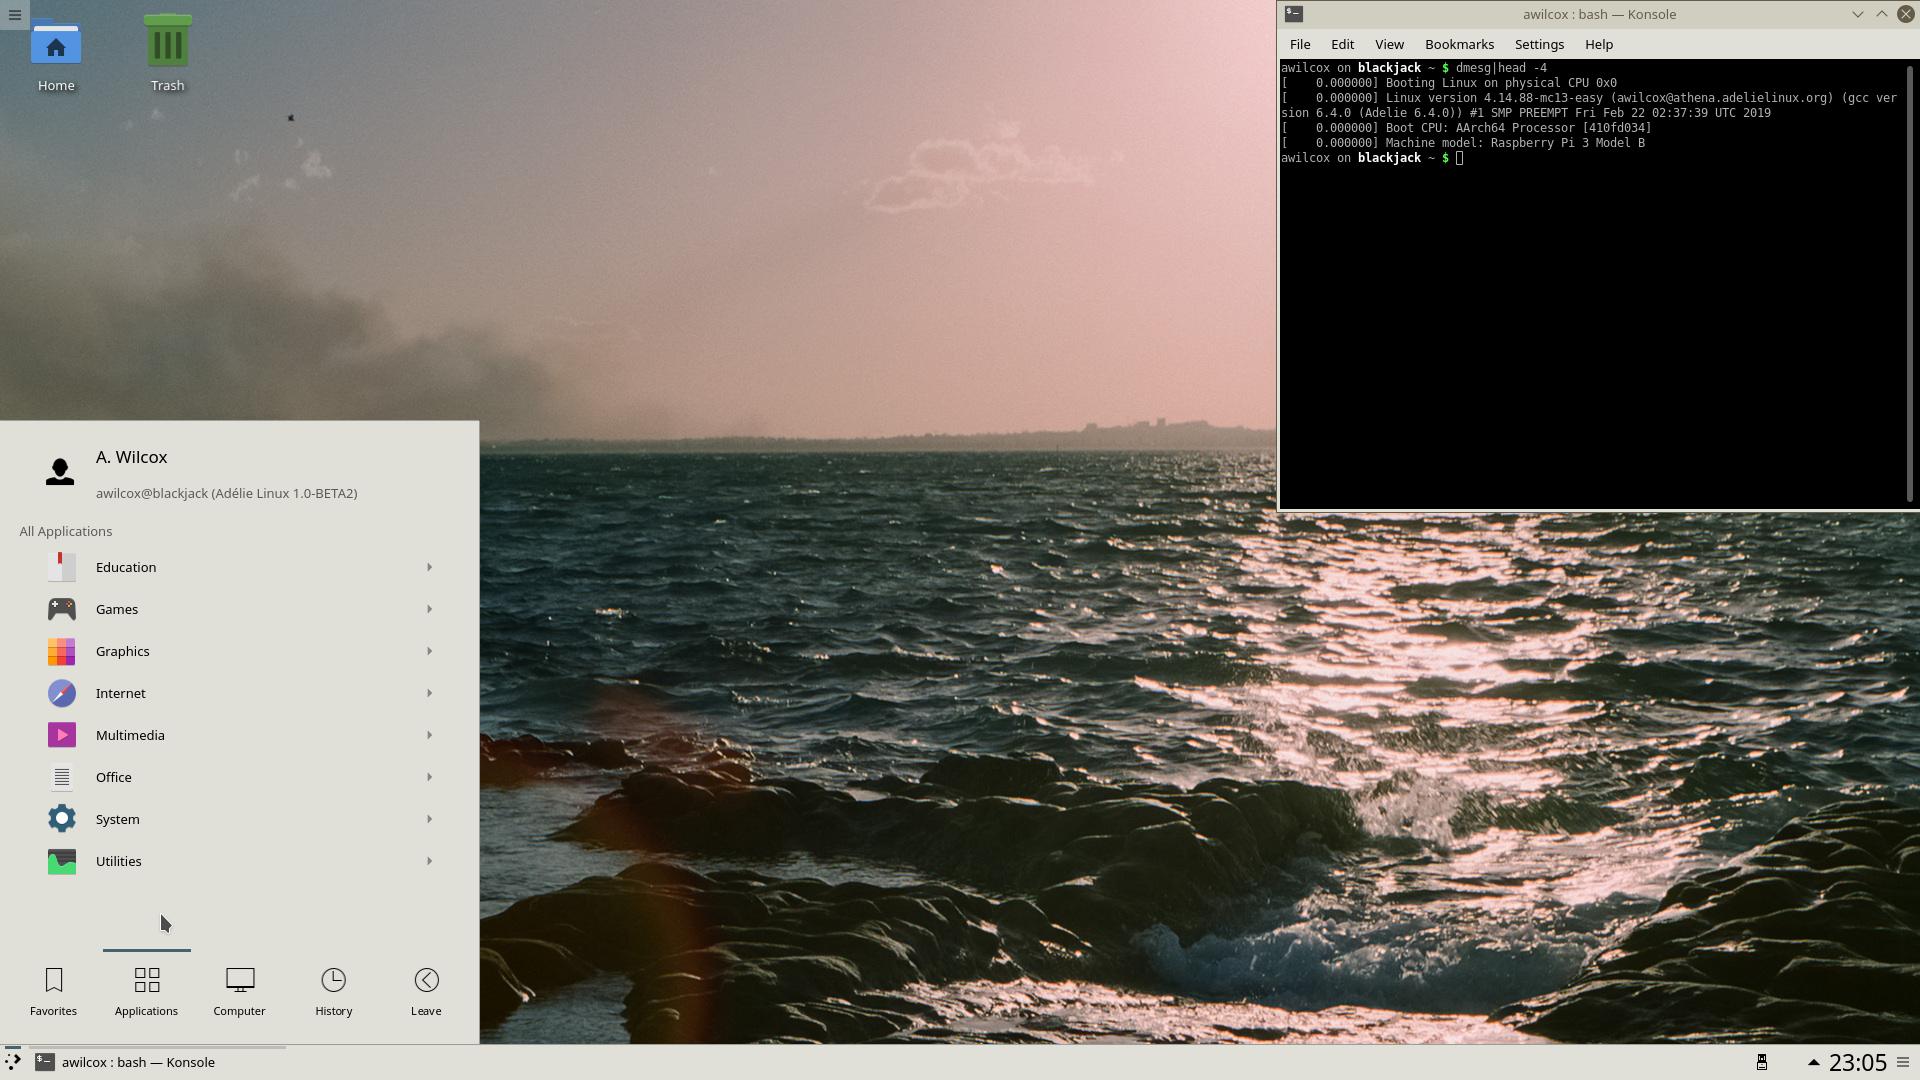 Booting a custom kernel/OS on the Raspberry Pi 3 B (64-bit